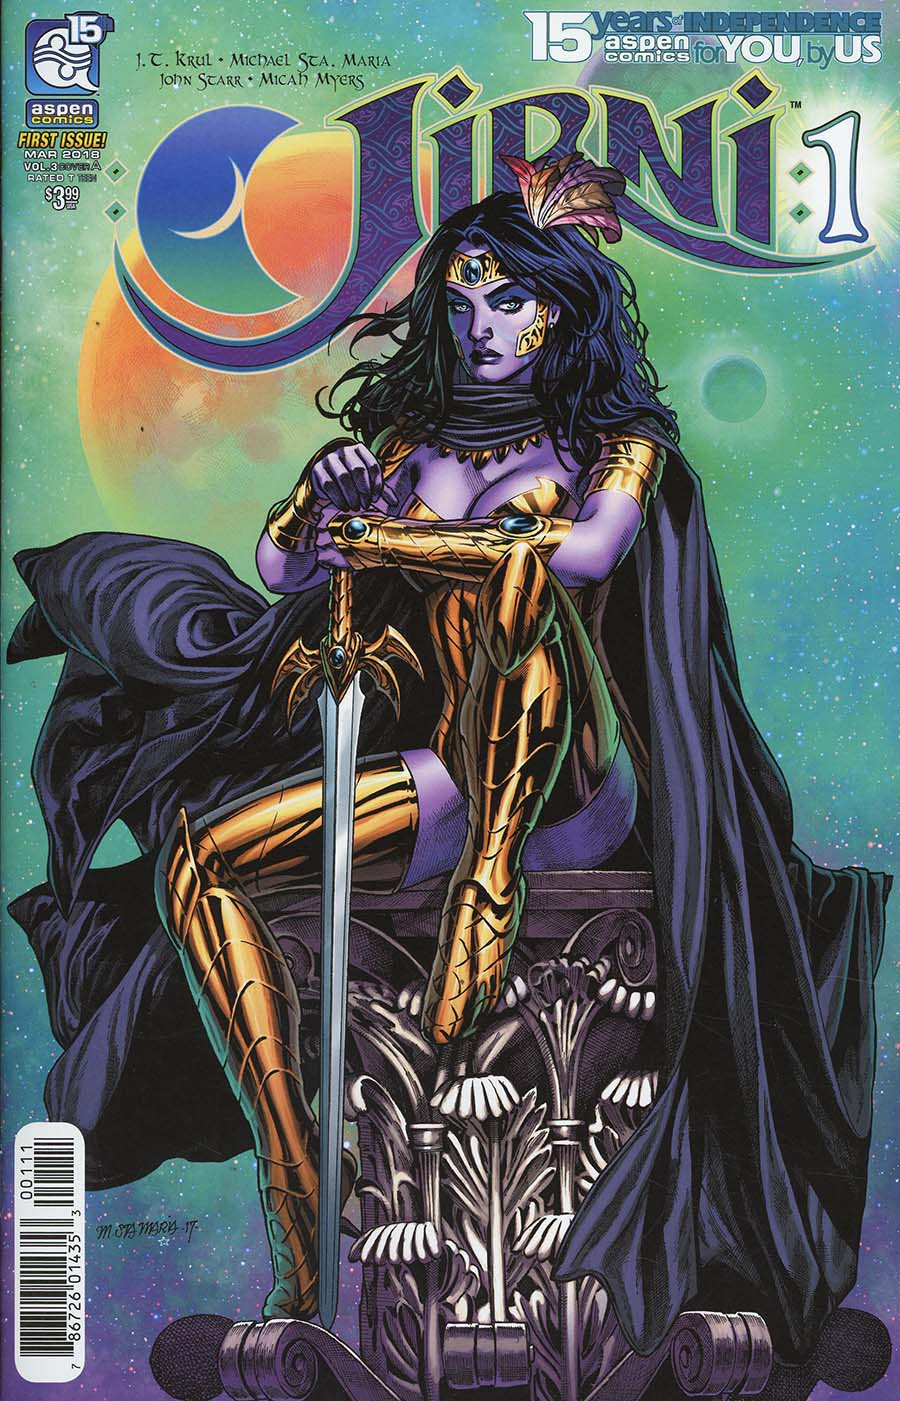 Jirni Vol 3 #1 Cover A Regular Michael Santamaria Cover